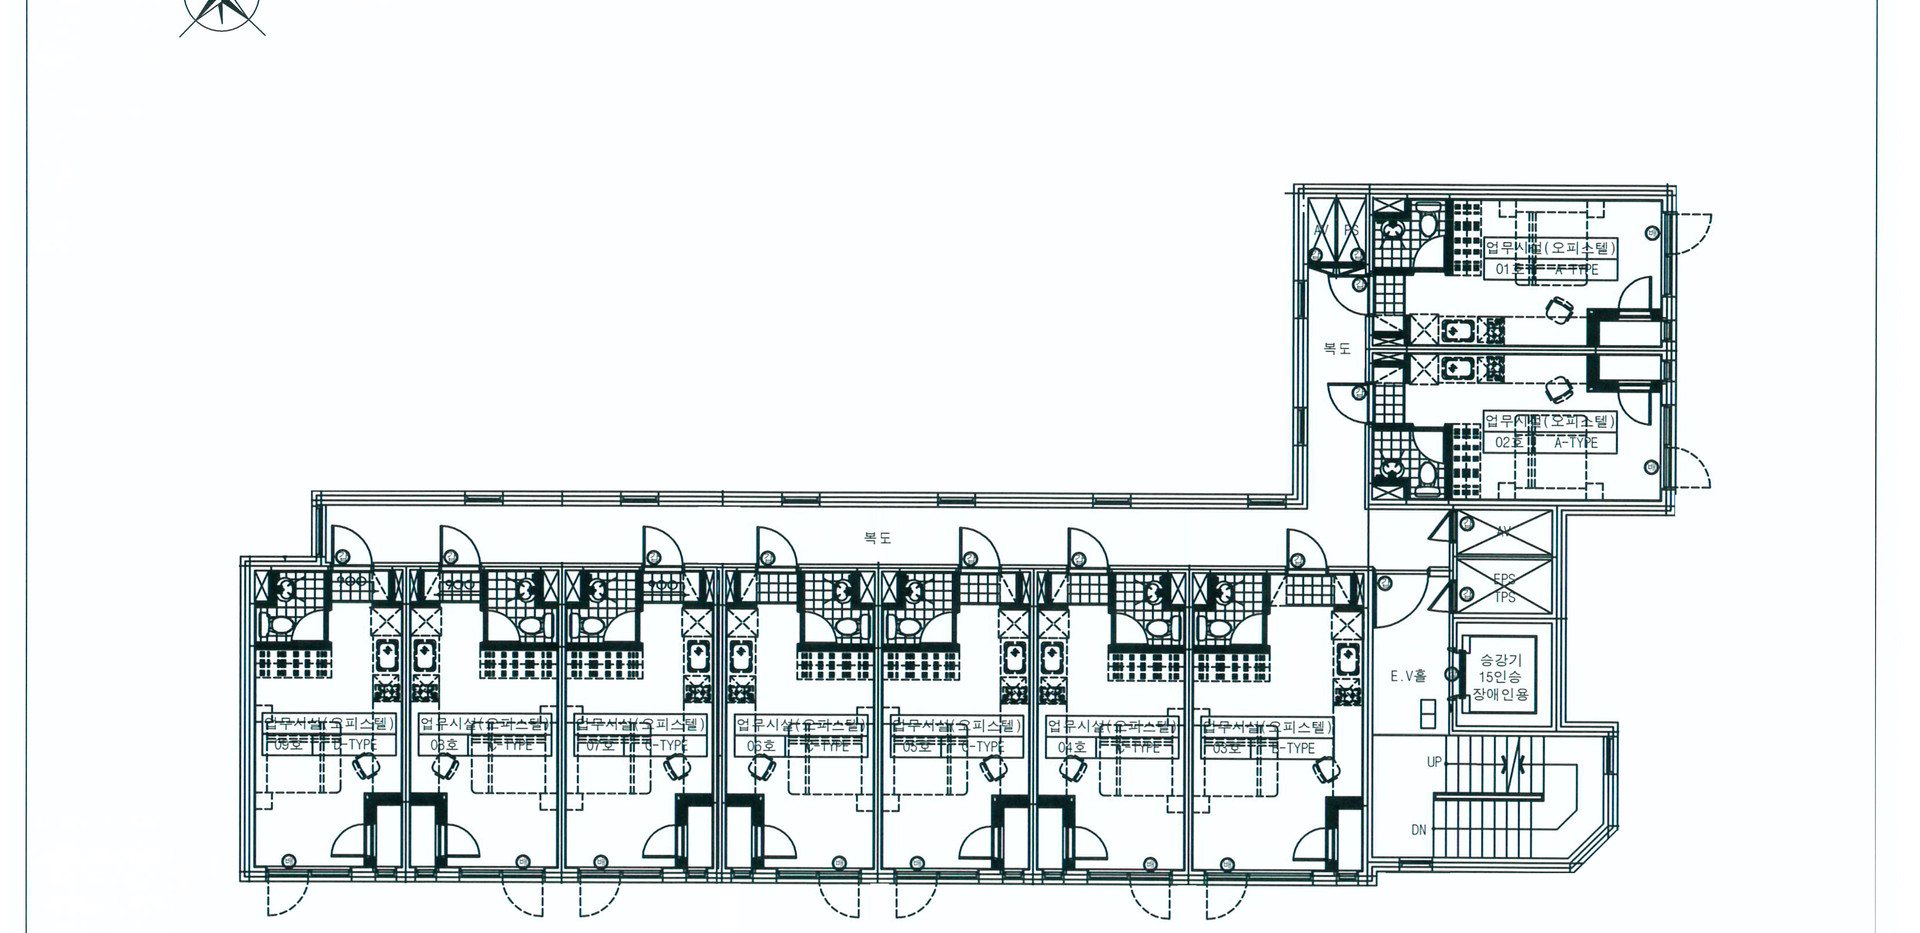 floorplan 4th floor